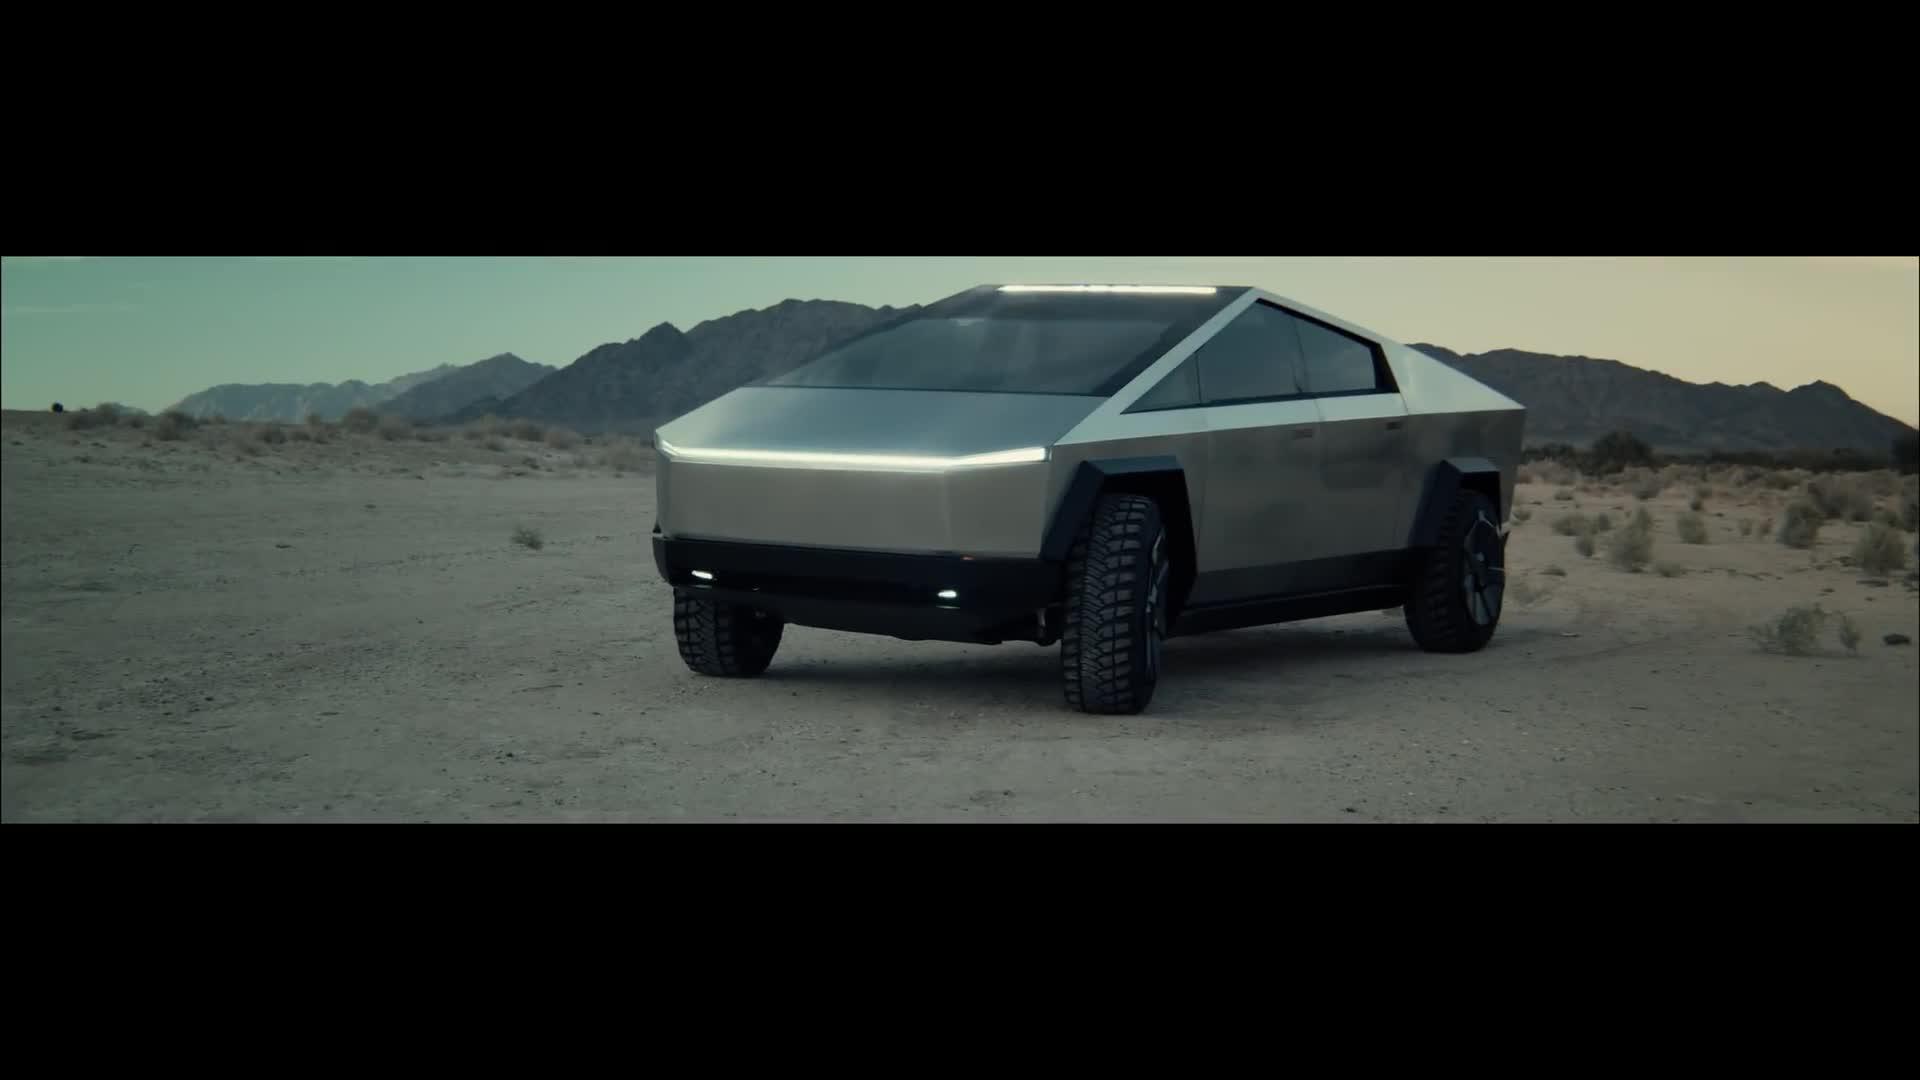 Auto, Fahrzeug, tesla, Cybertruck, Fahrzeuge, Pickup, Tesla Cybertruck, Pick-up